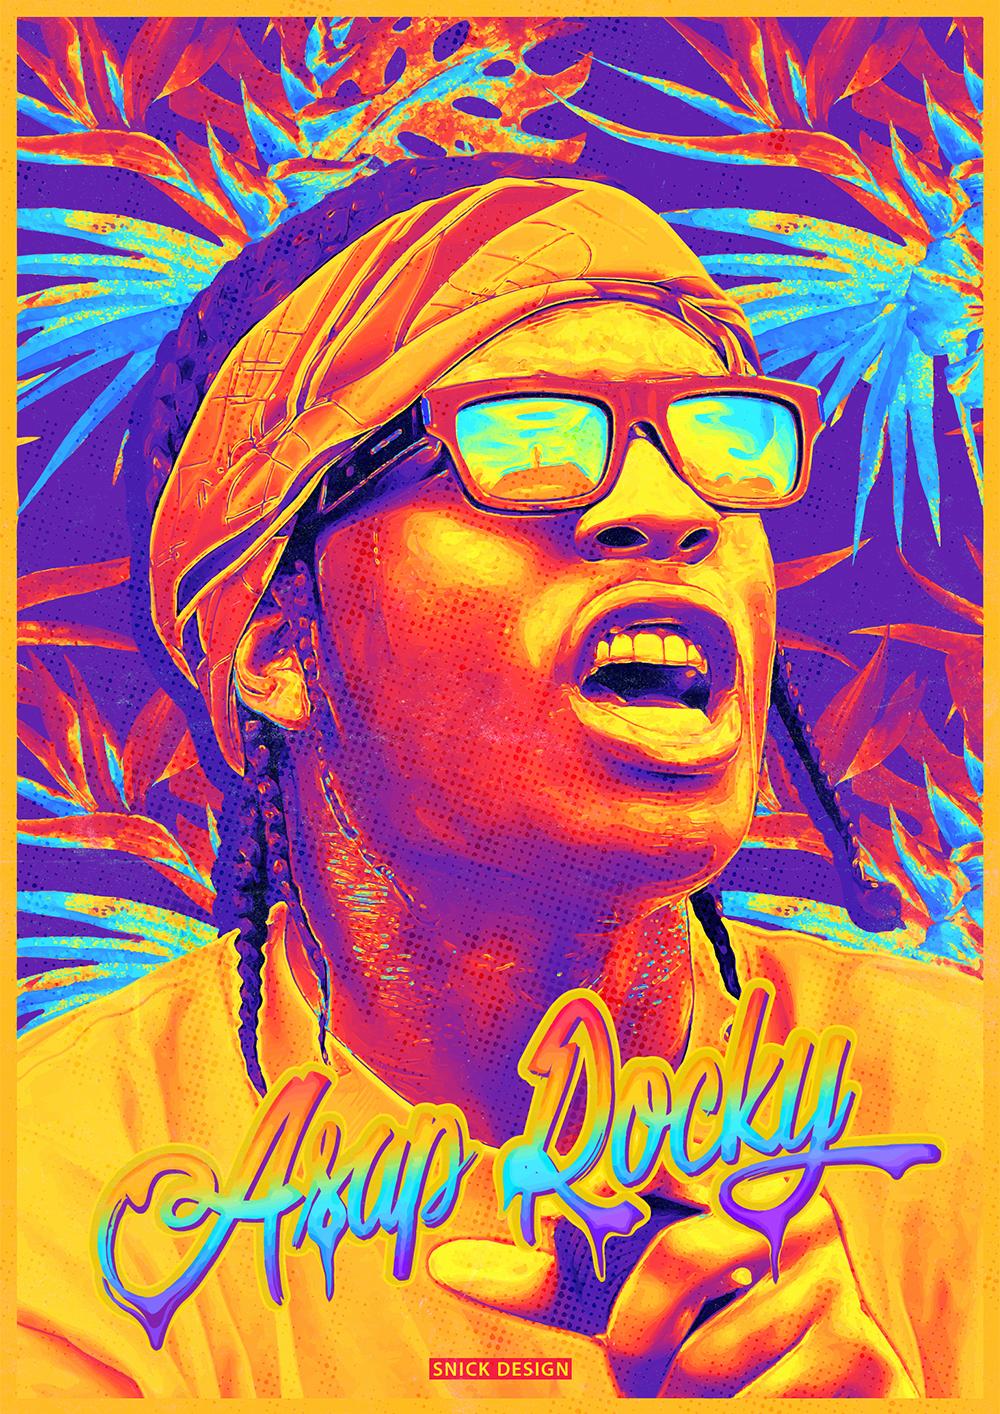 Three famous HipHop artistsTravis Scott, Asap Rocky